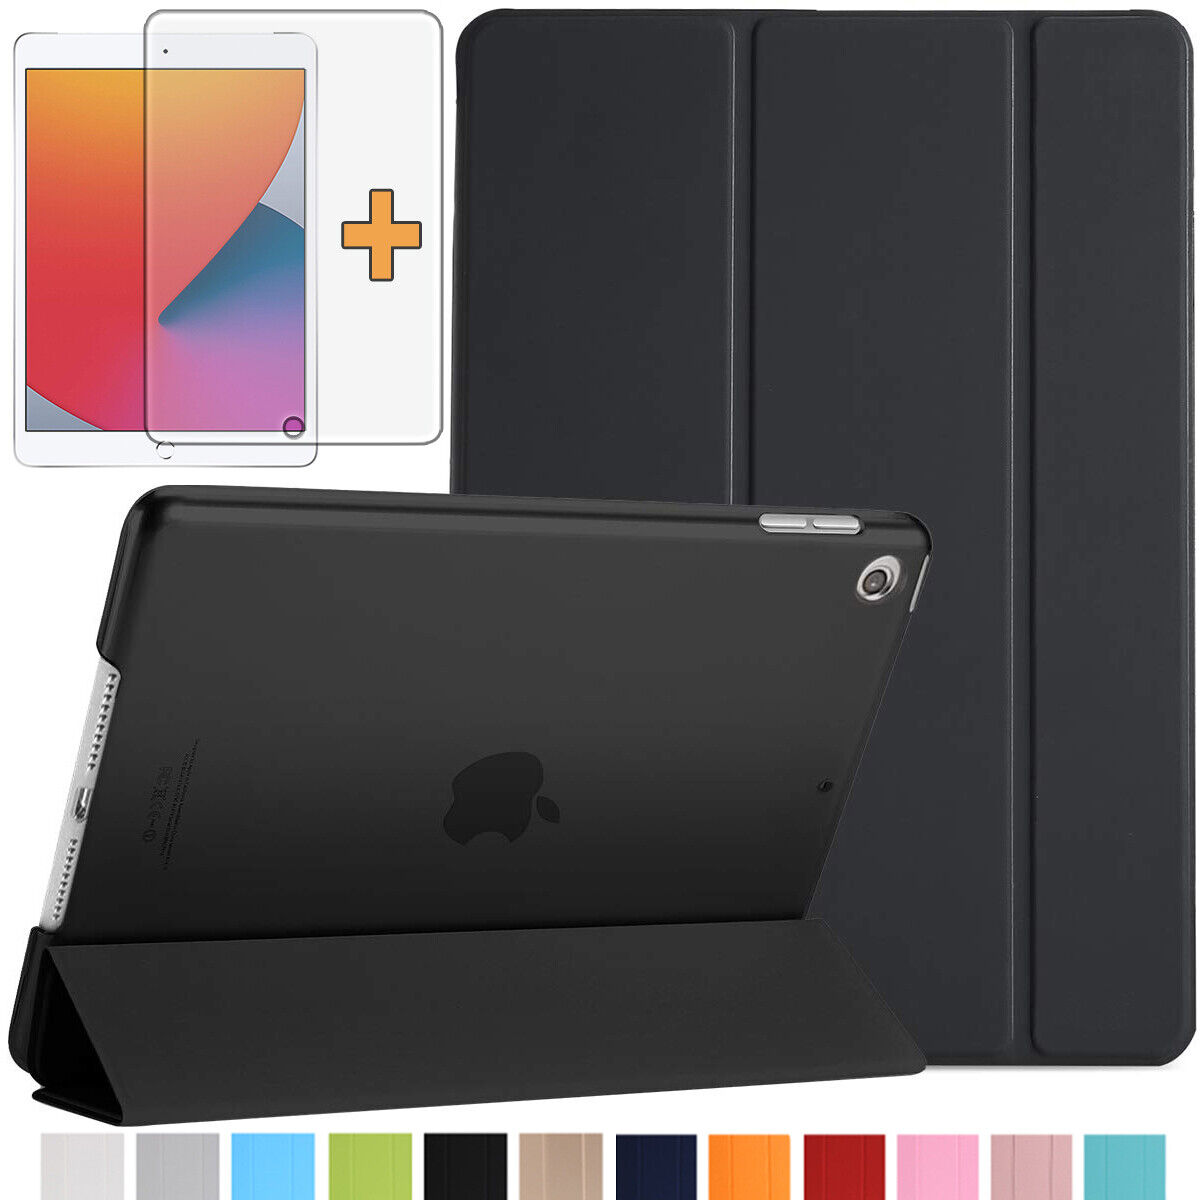 Smart Cover iPad 10.2 2020 (8.Gen) / 2019 (7.Gen) Schutzhülle Case +Folie -3